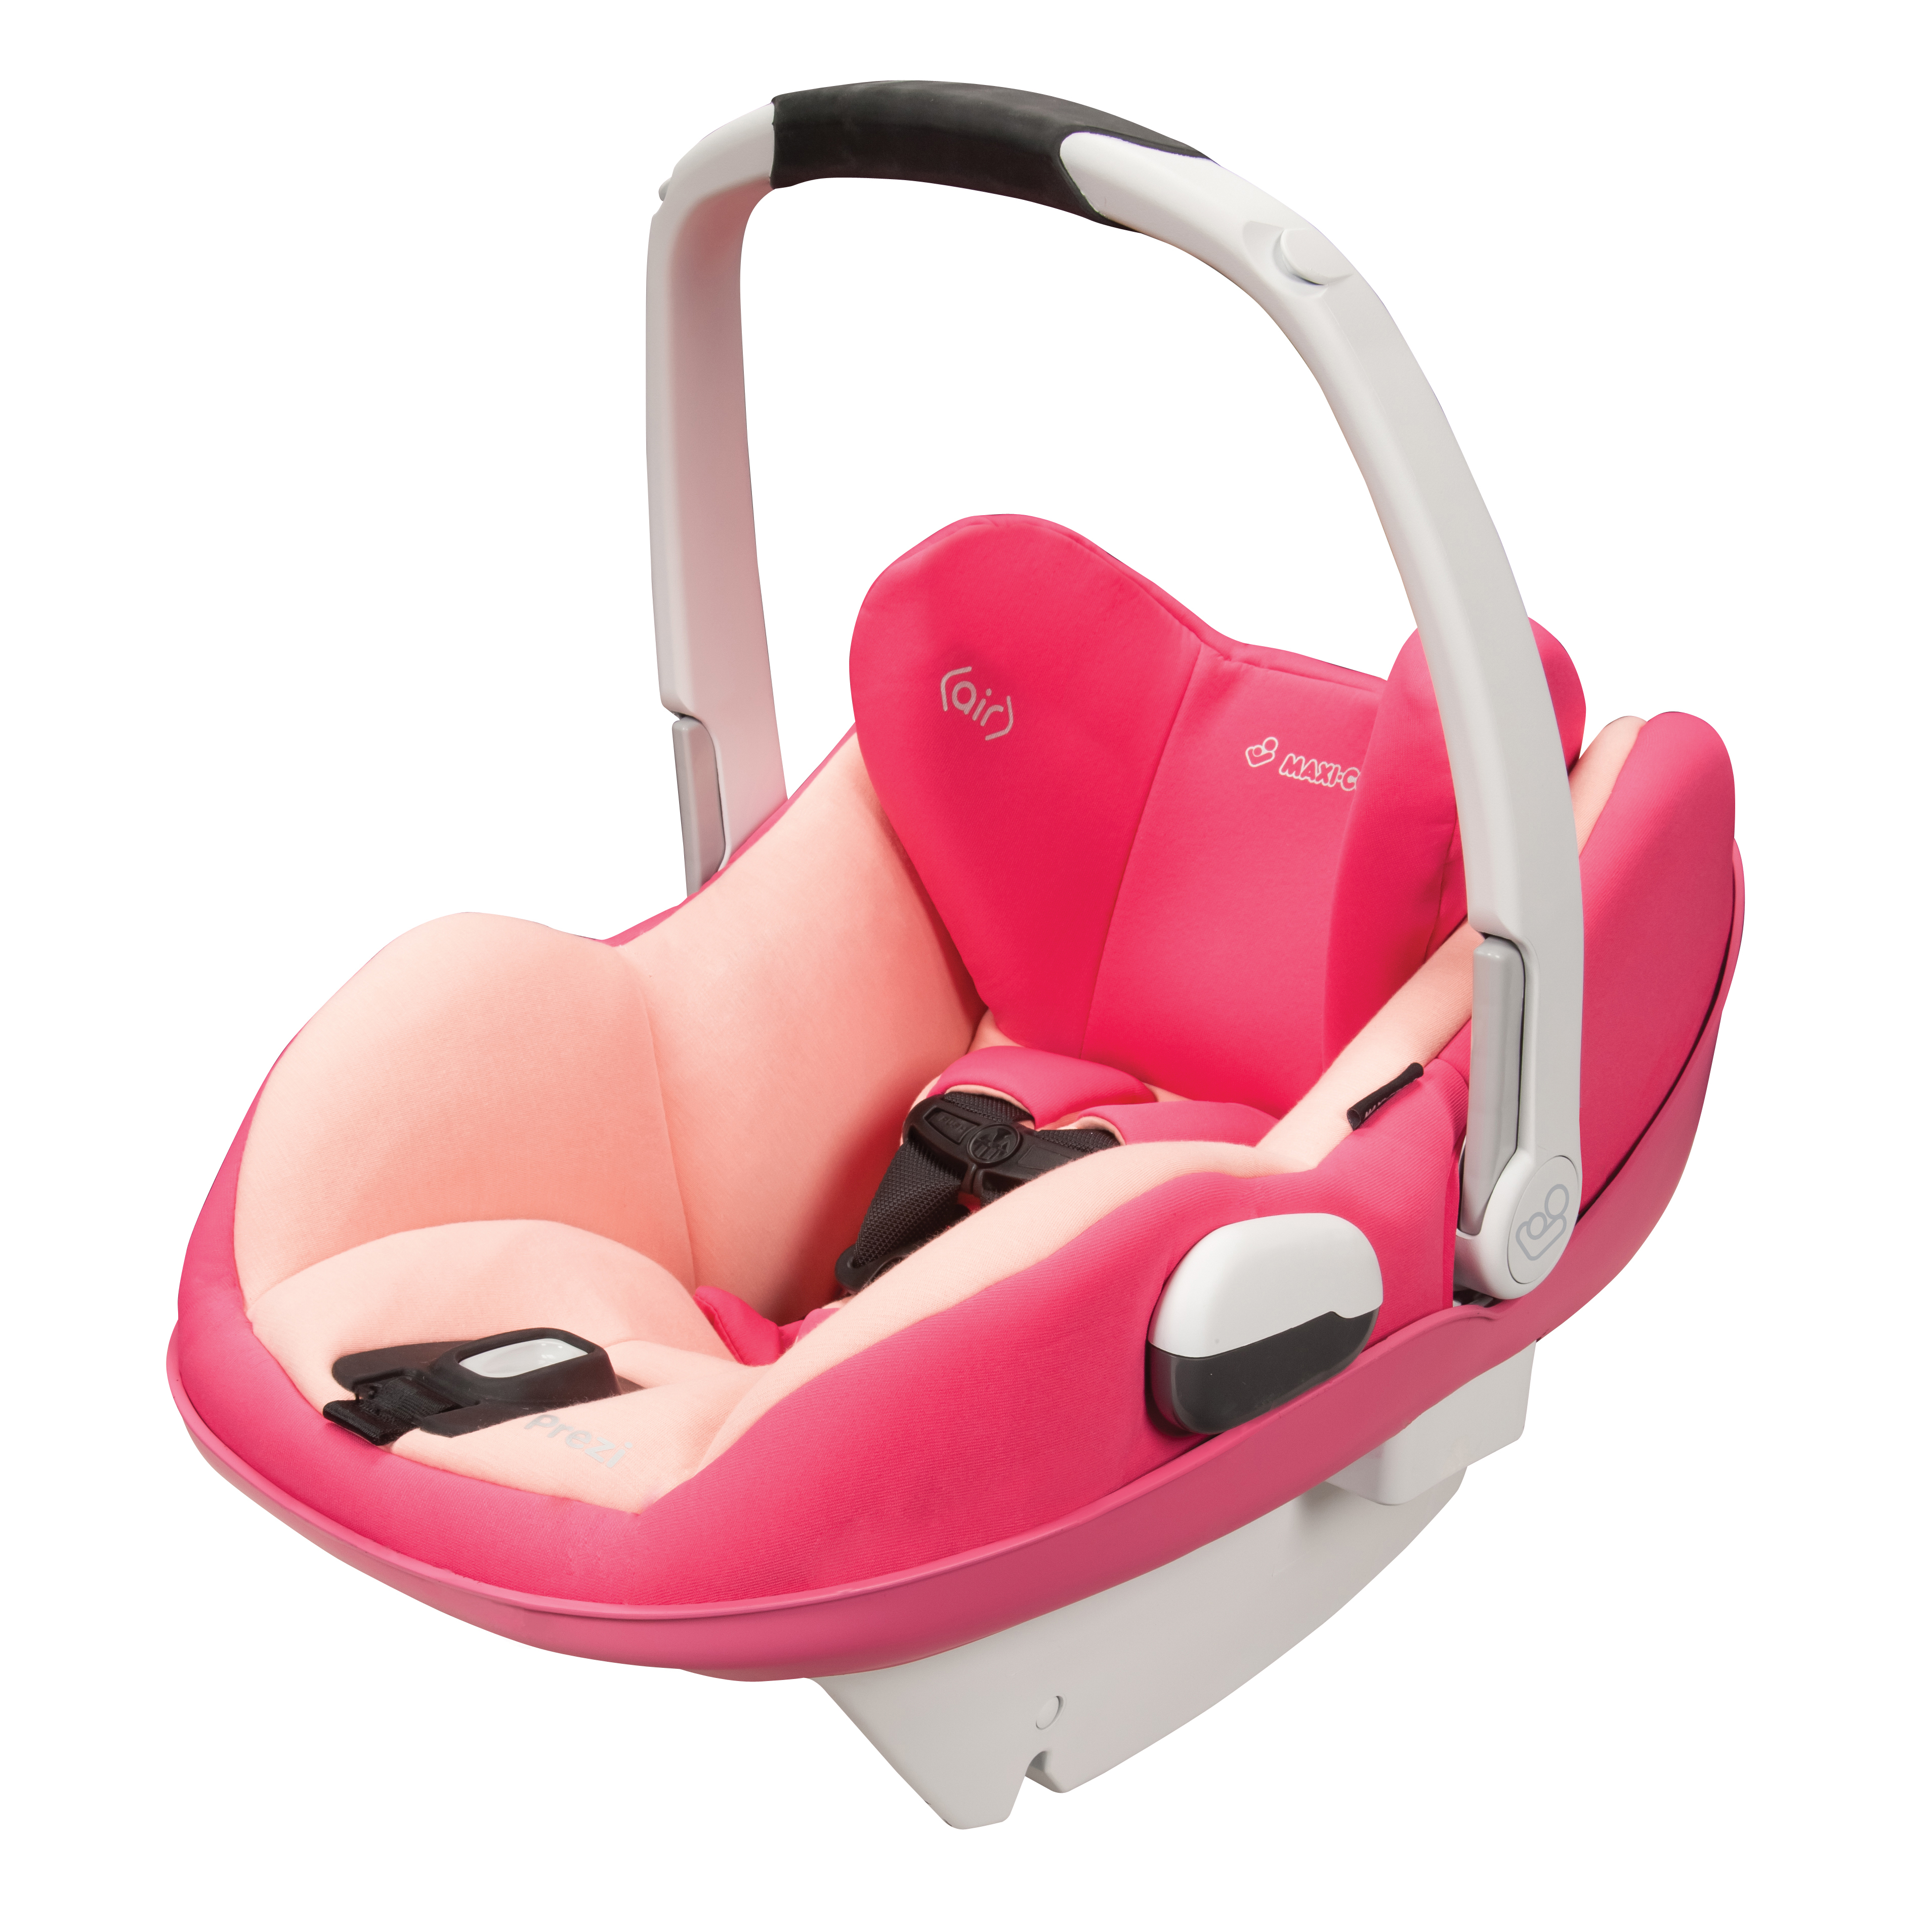 Hot Pink Infant Car Seat Maxi Cosi